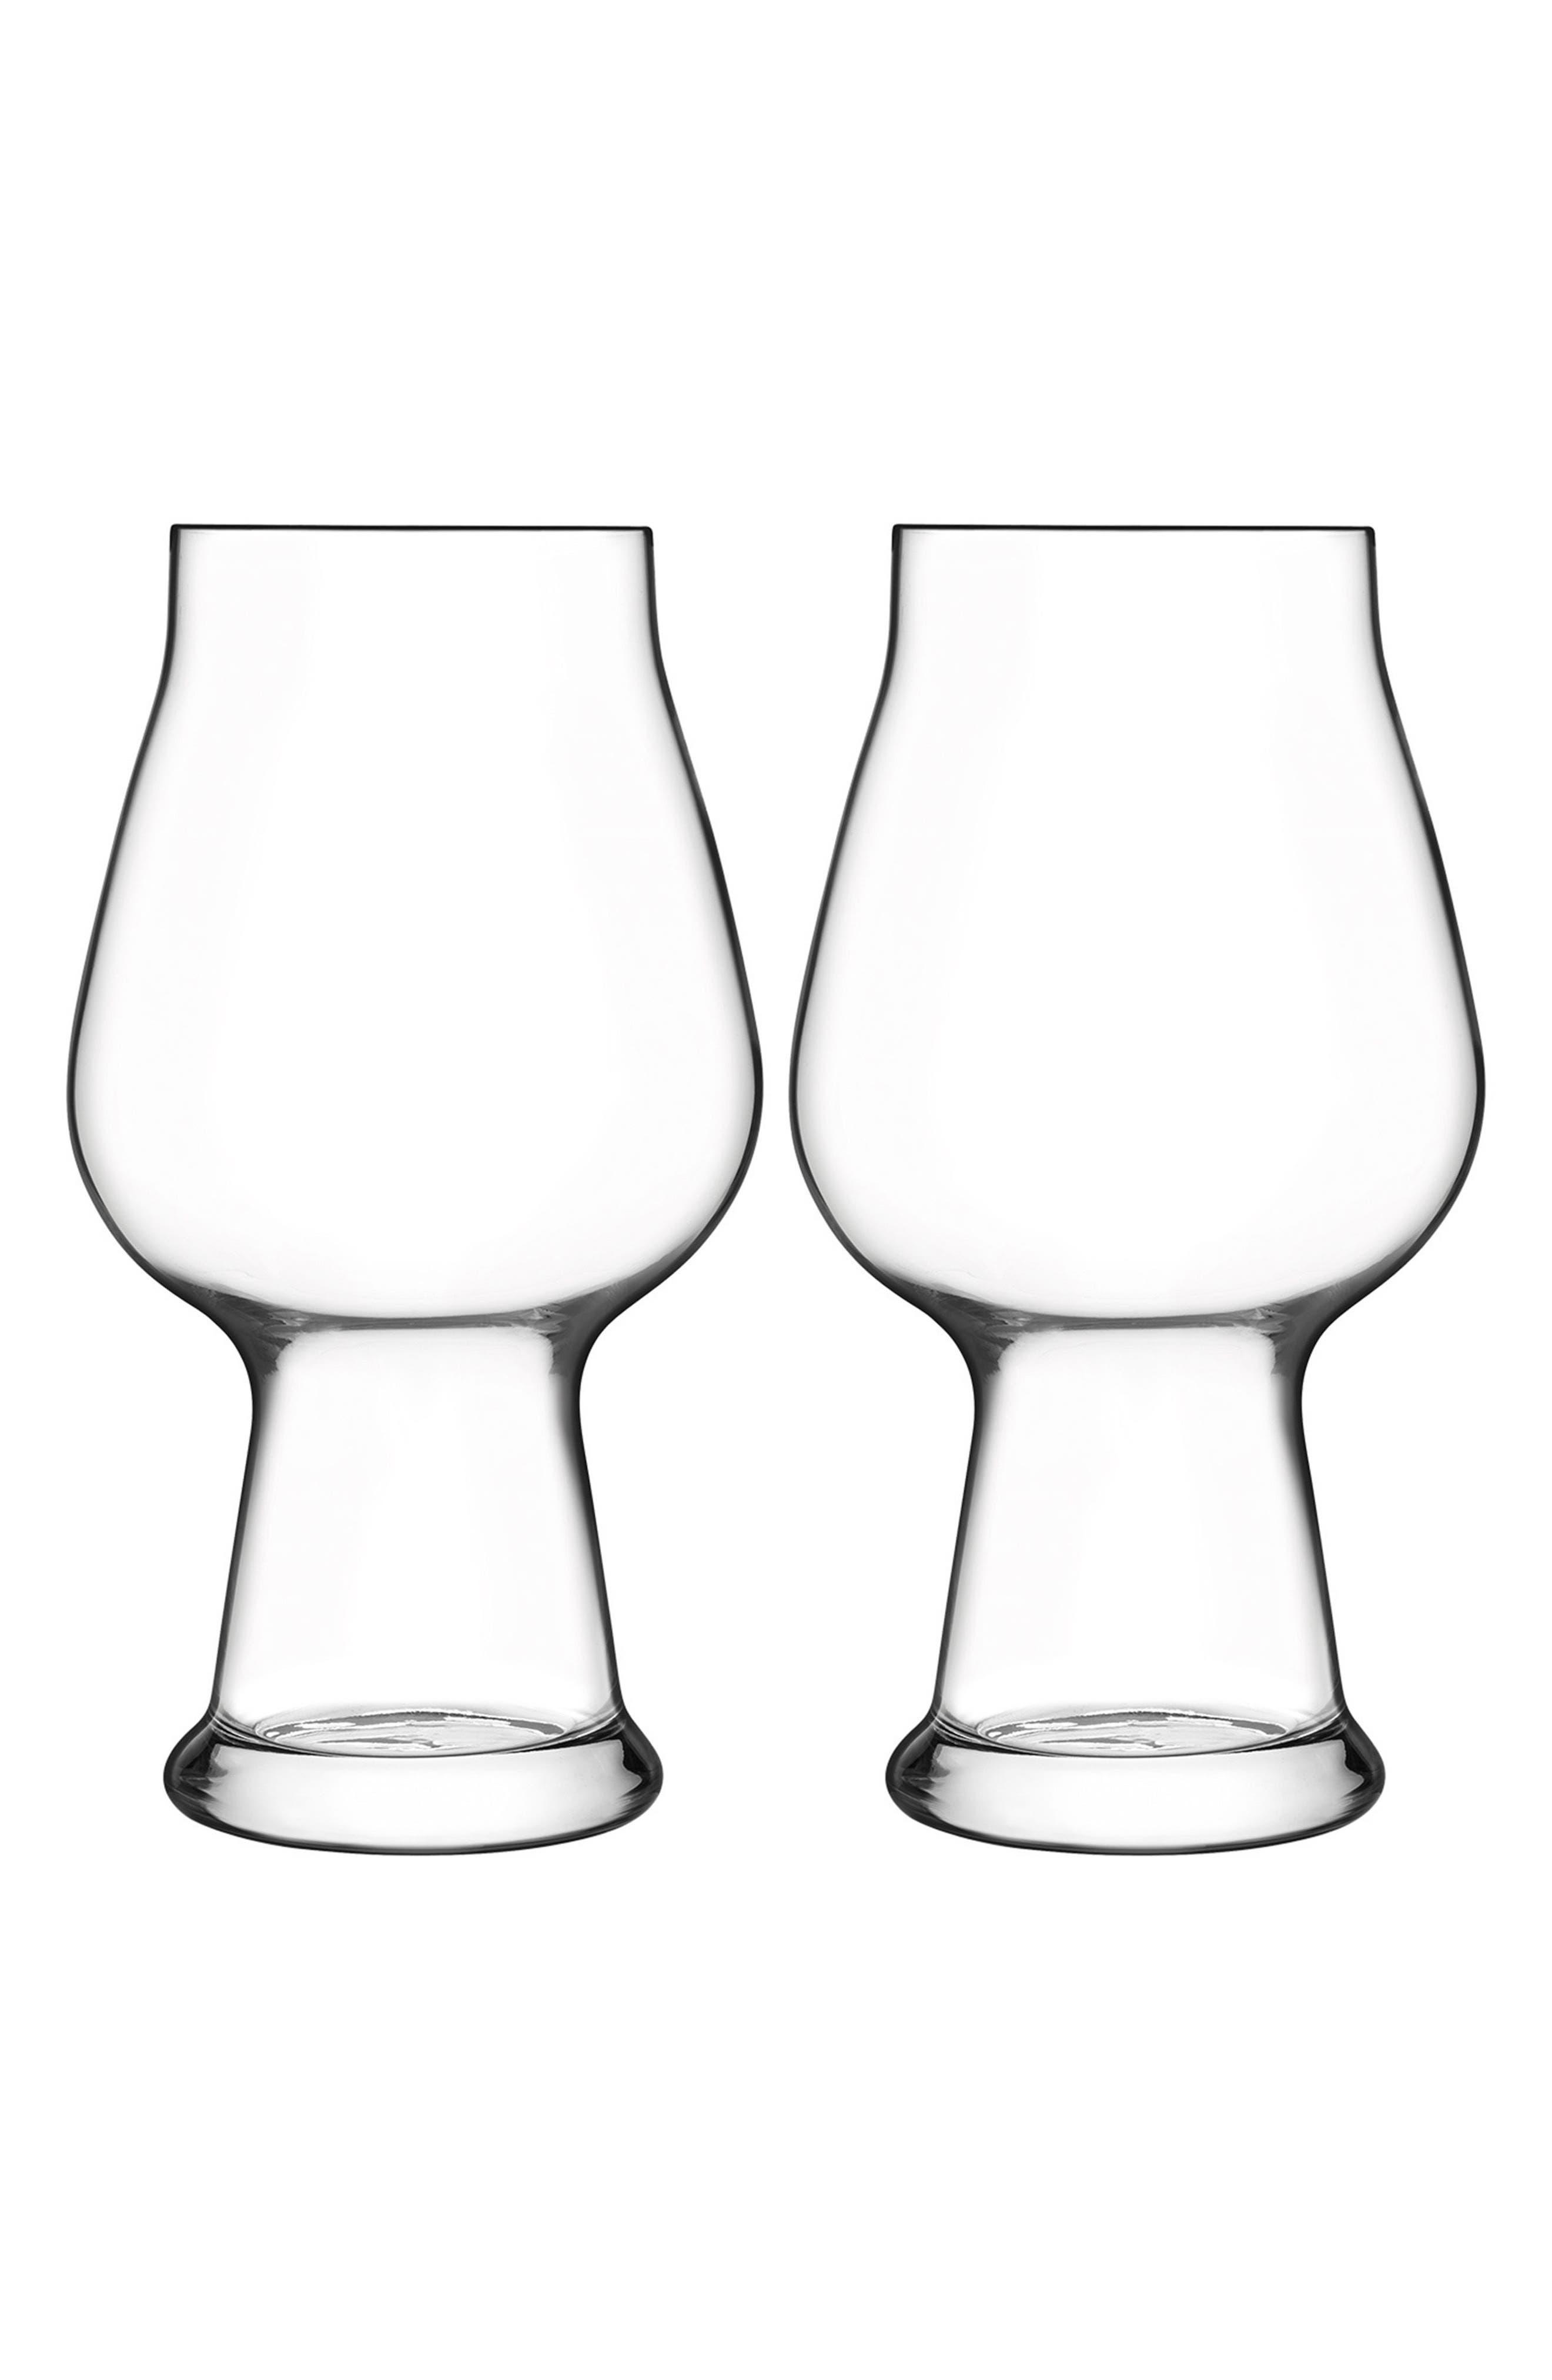 Birrateque Set of 2 Stout Glasses,                         Main,                         color, Clear